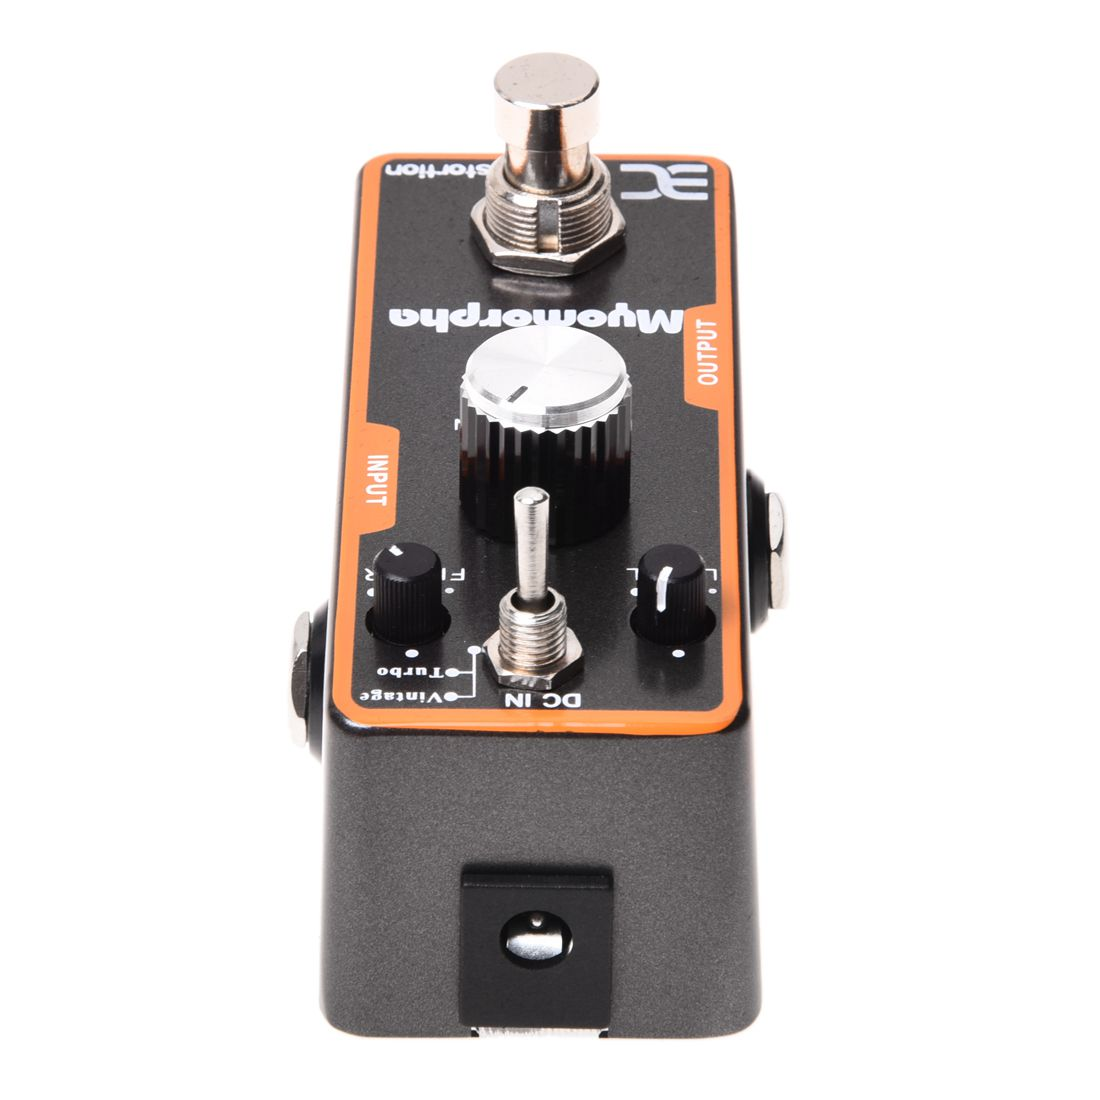 ENO TC-13 Music Distortion Mini Pedal Myomorpha True Bypass плиткорез электрический кратон tc 13